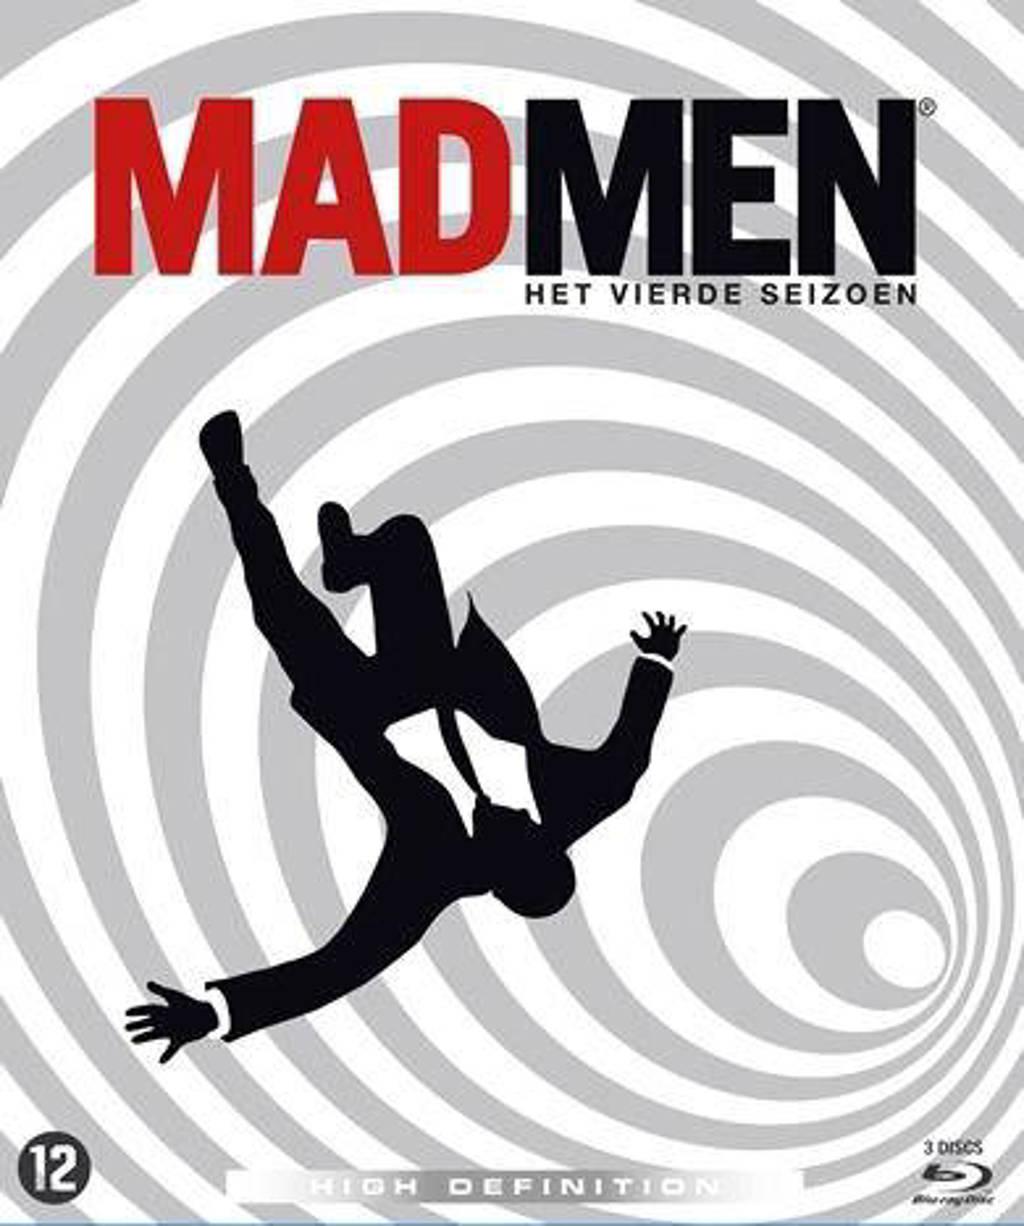 Mad men - Seizoen 4 (Blu-ray)